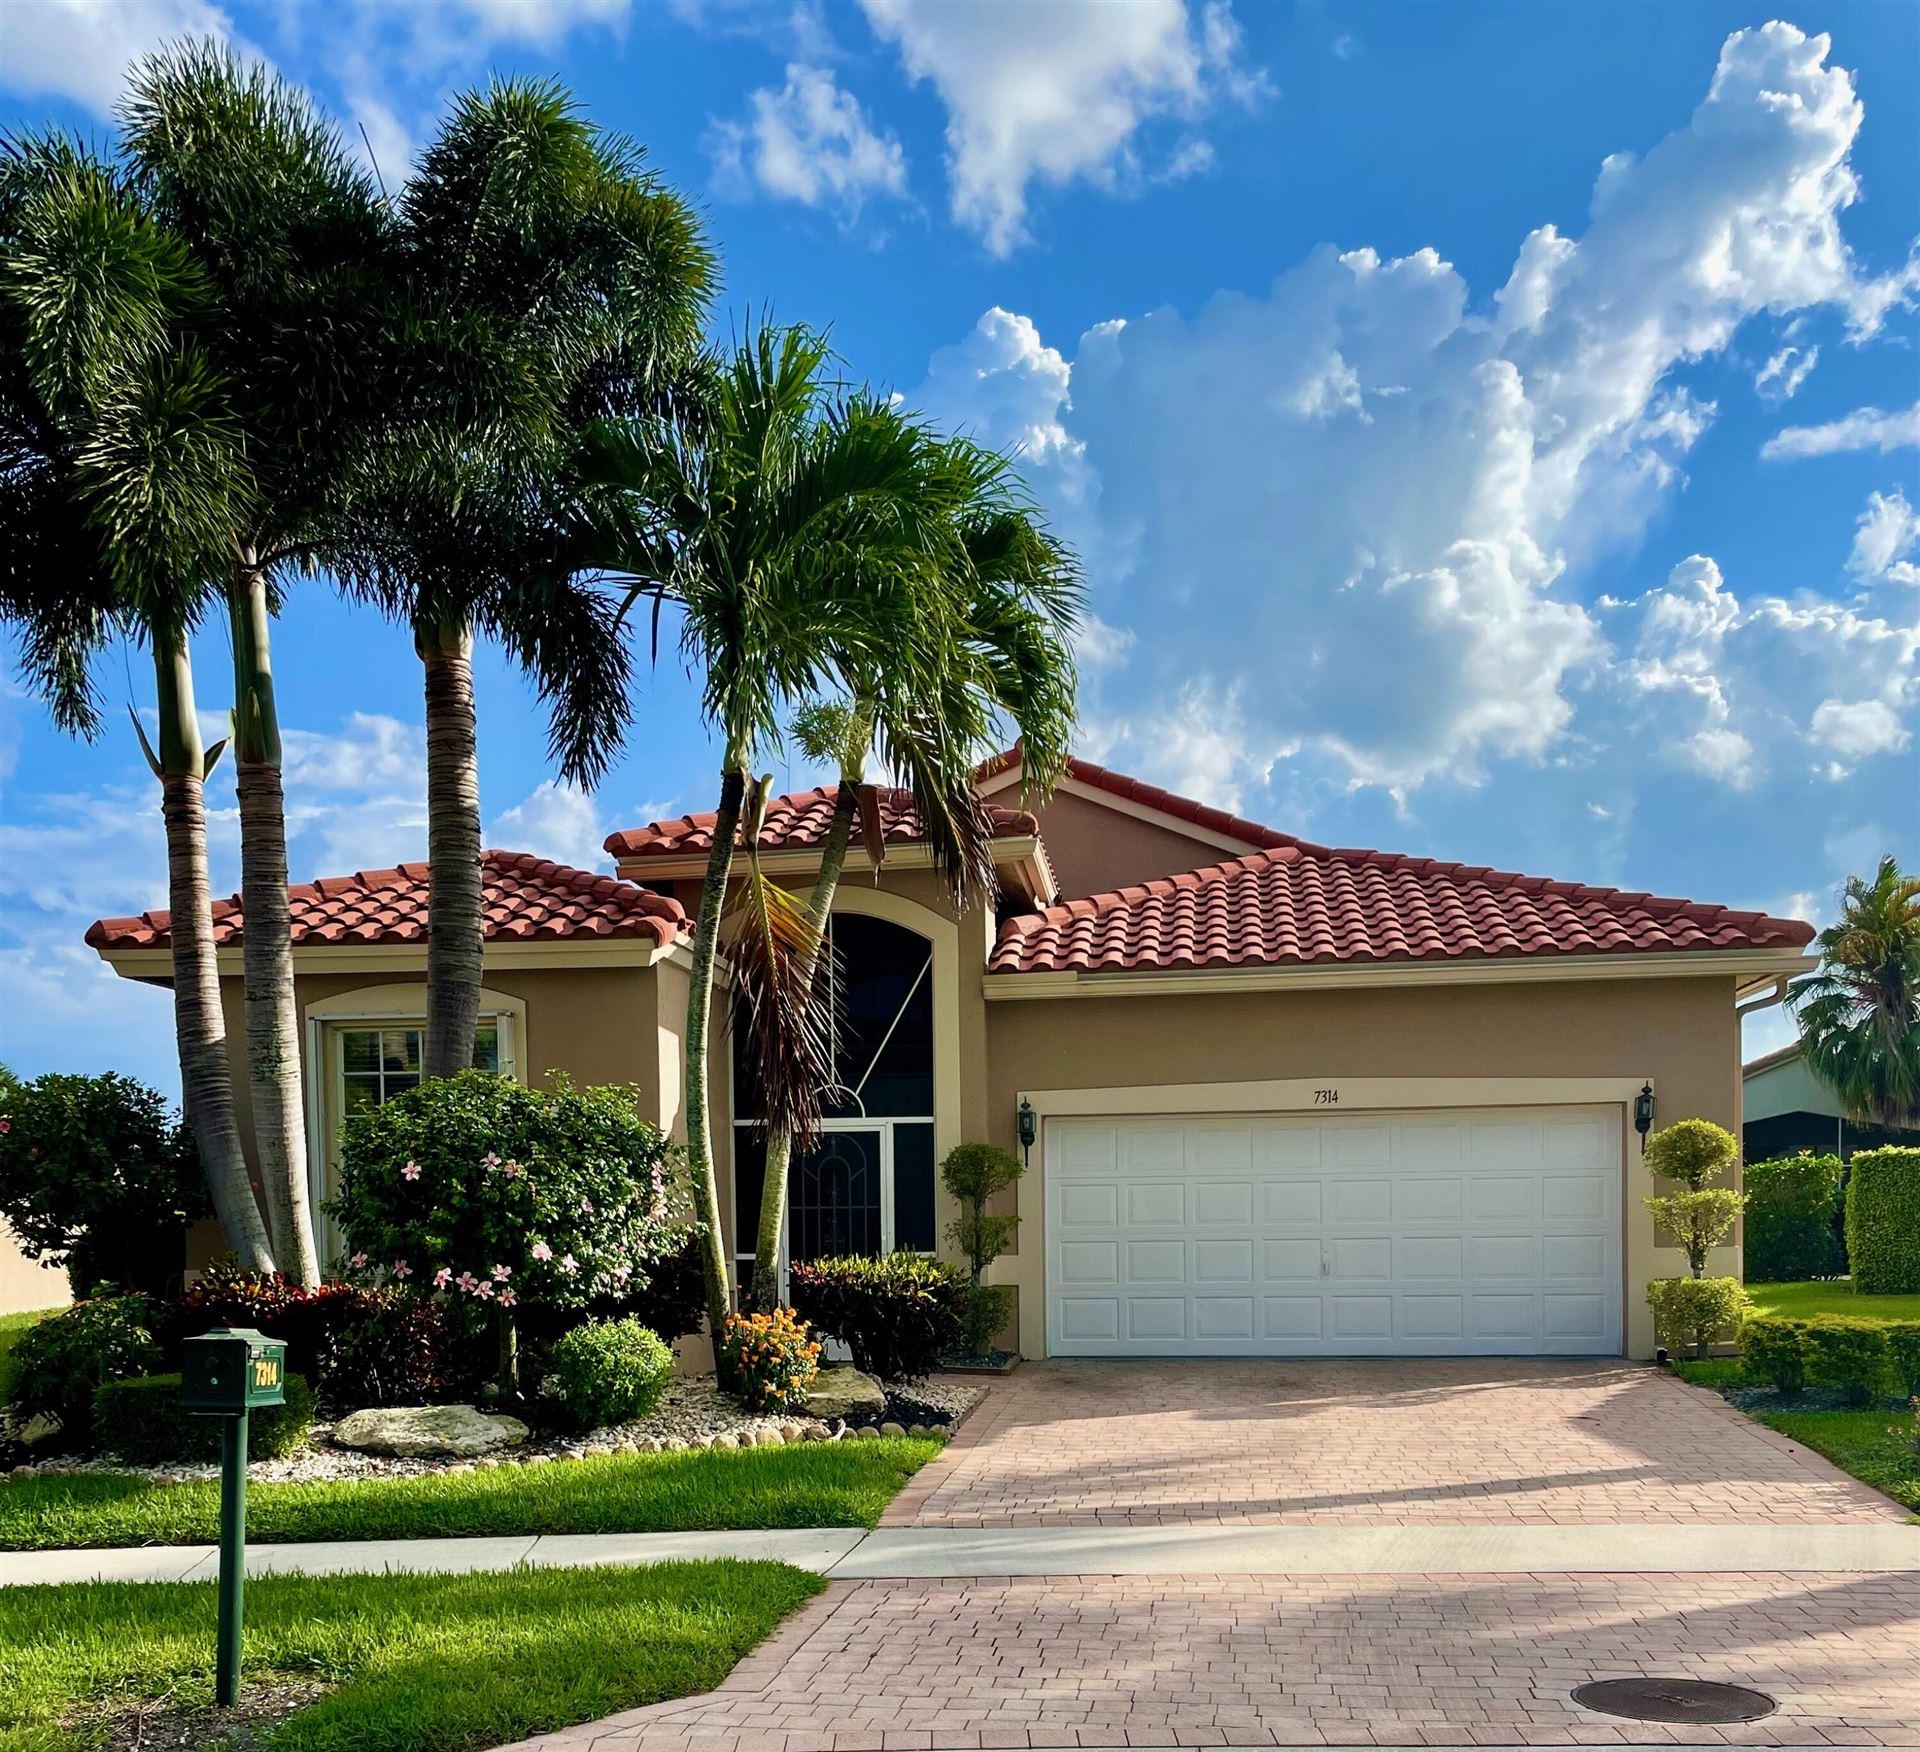 7314 Toscane Court, Boynton Beach, FL 33437 - MLS#: RX-10743009